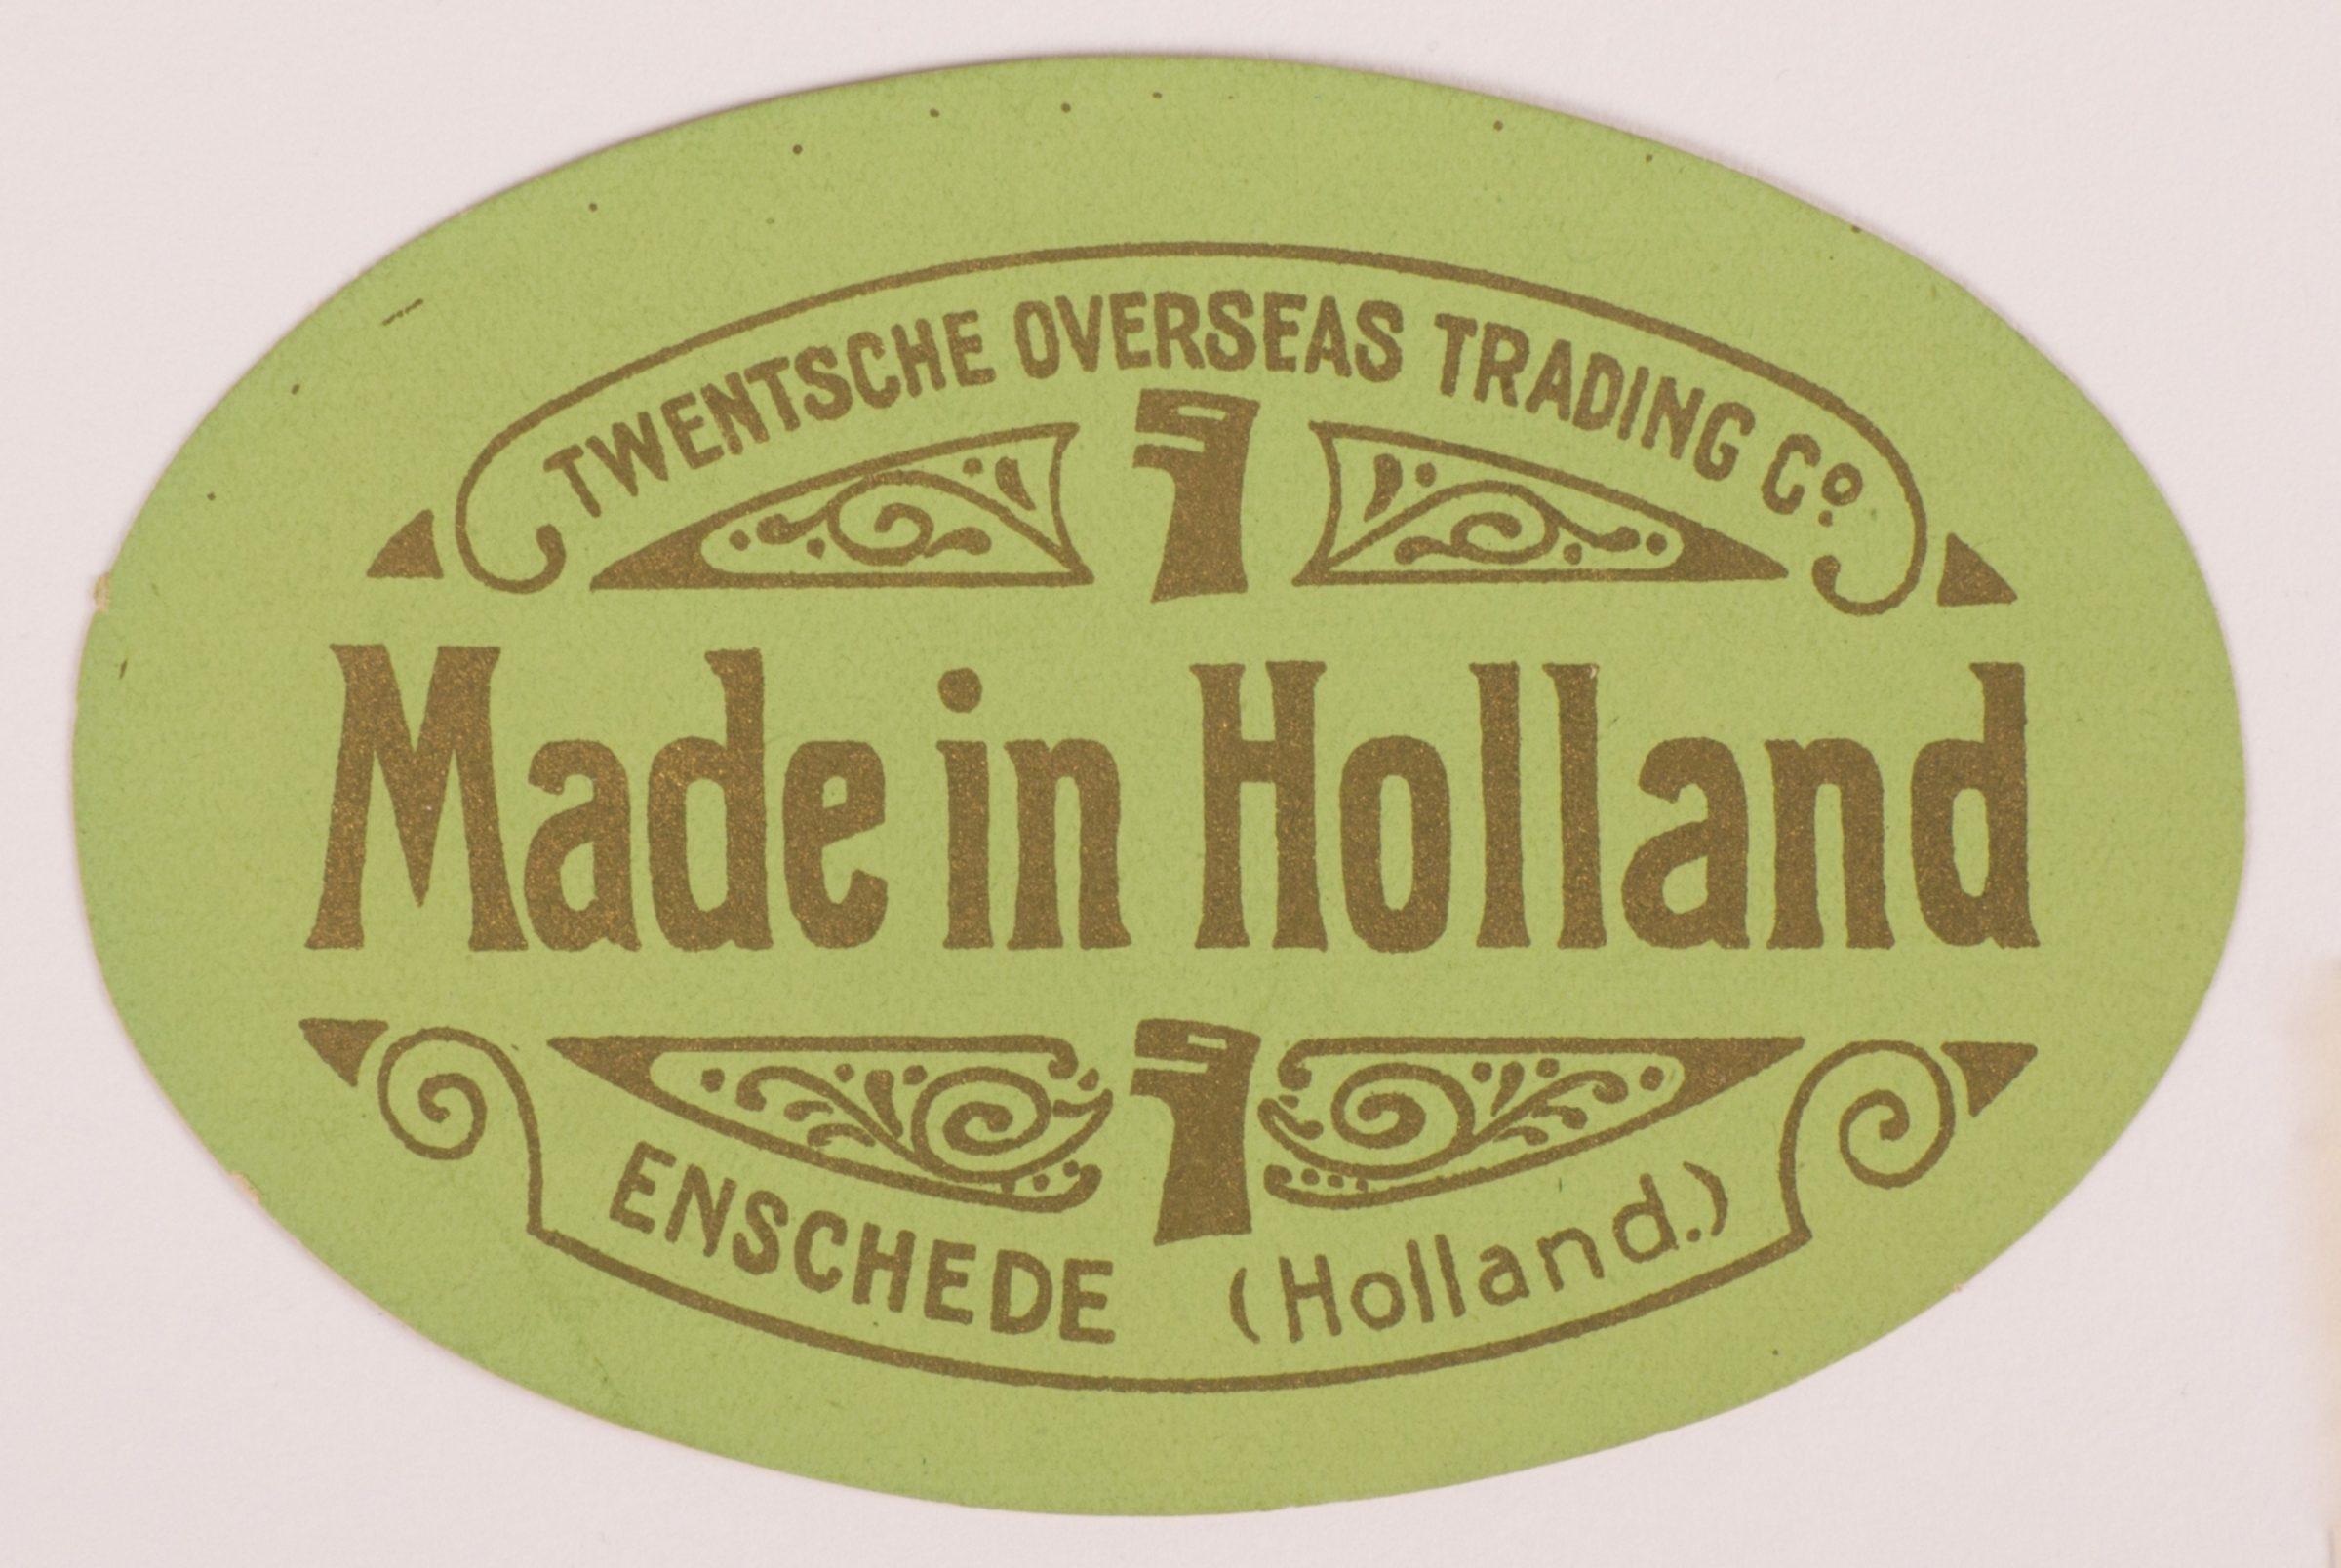 Twentsche Overseas Trading Made in Holland groen 1369 1536825792 35ht2wu0iu